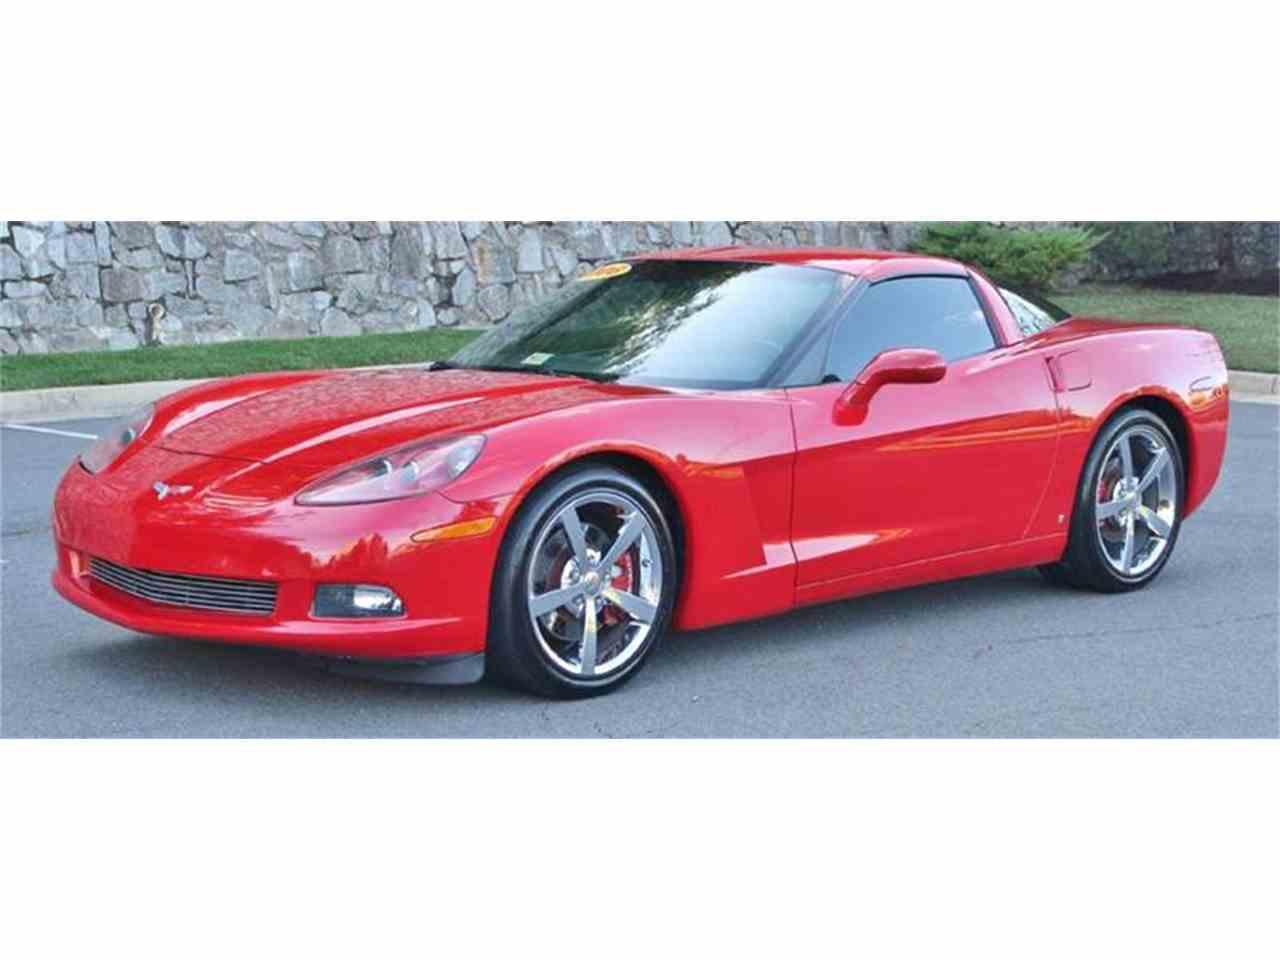 2006 chevrolet corvette for sale cc 630523. Black Bedroom Furniture Sets. Home Design Ideas